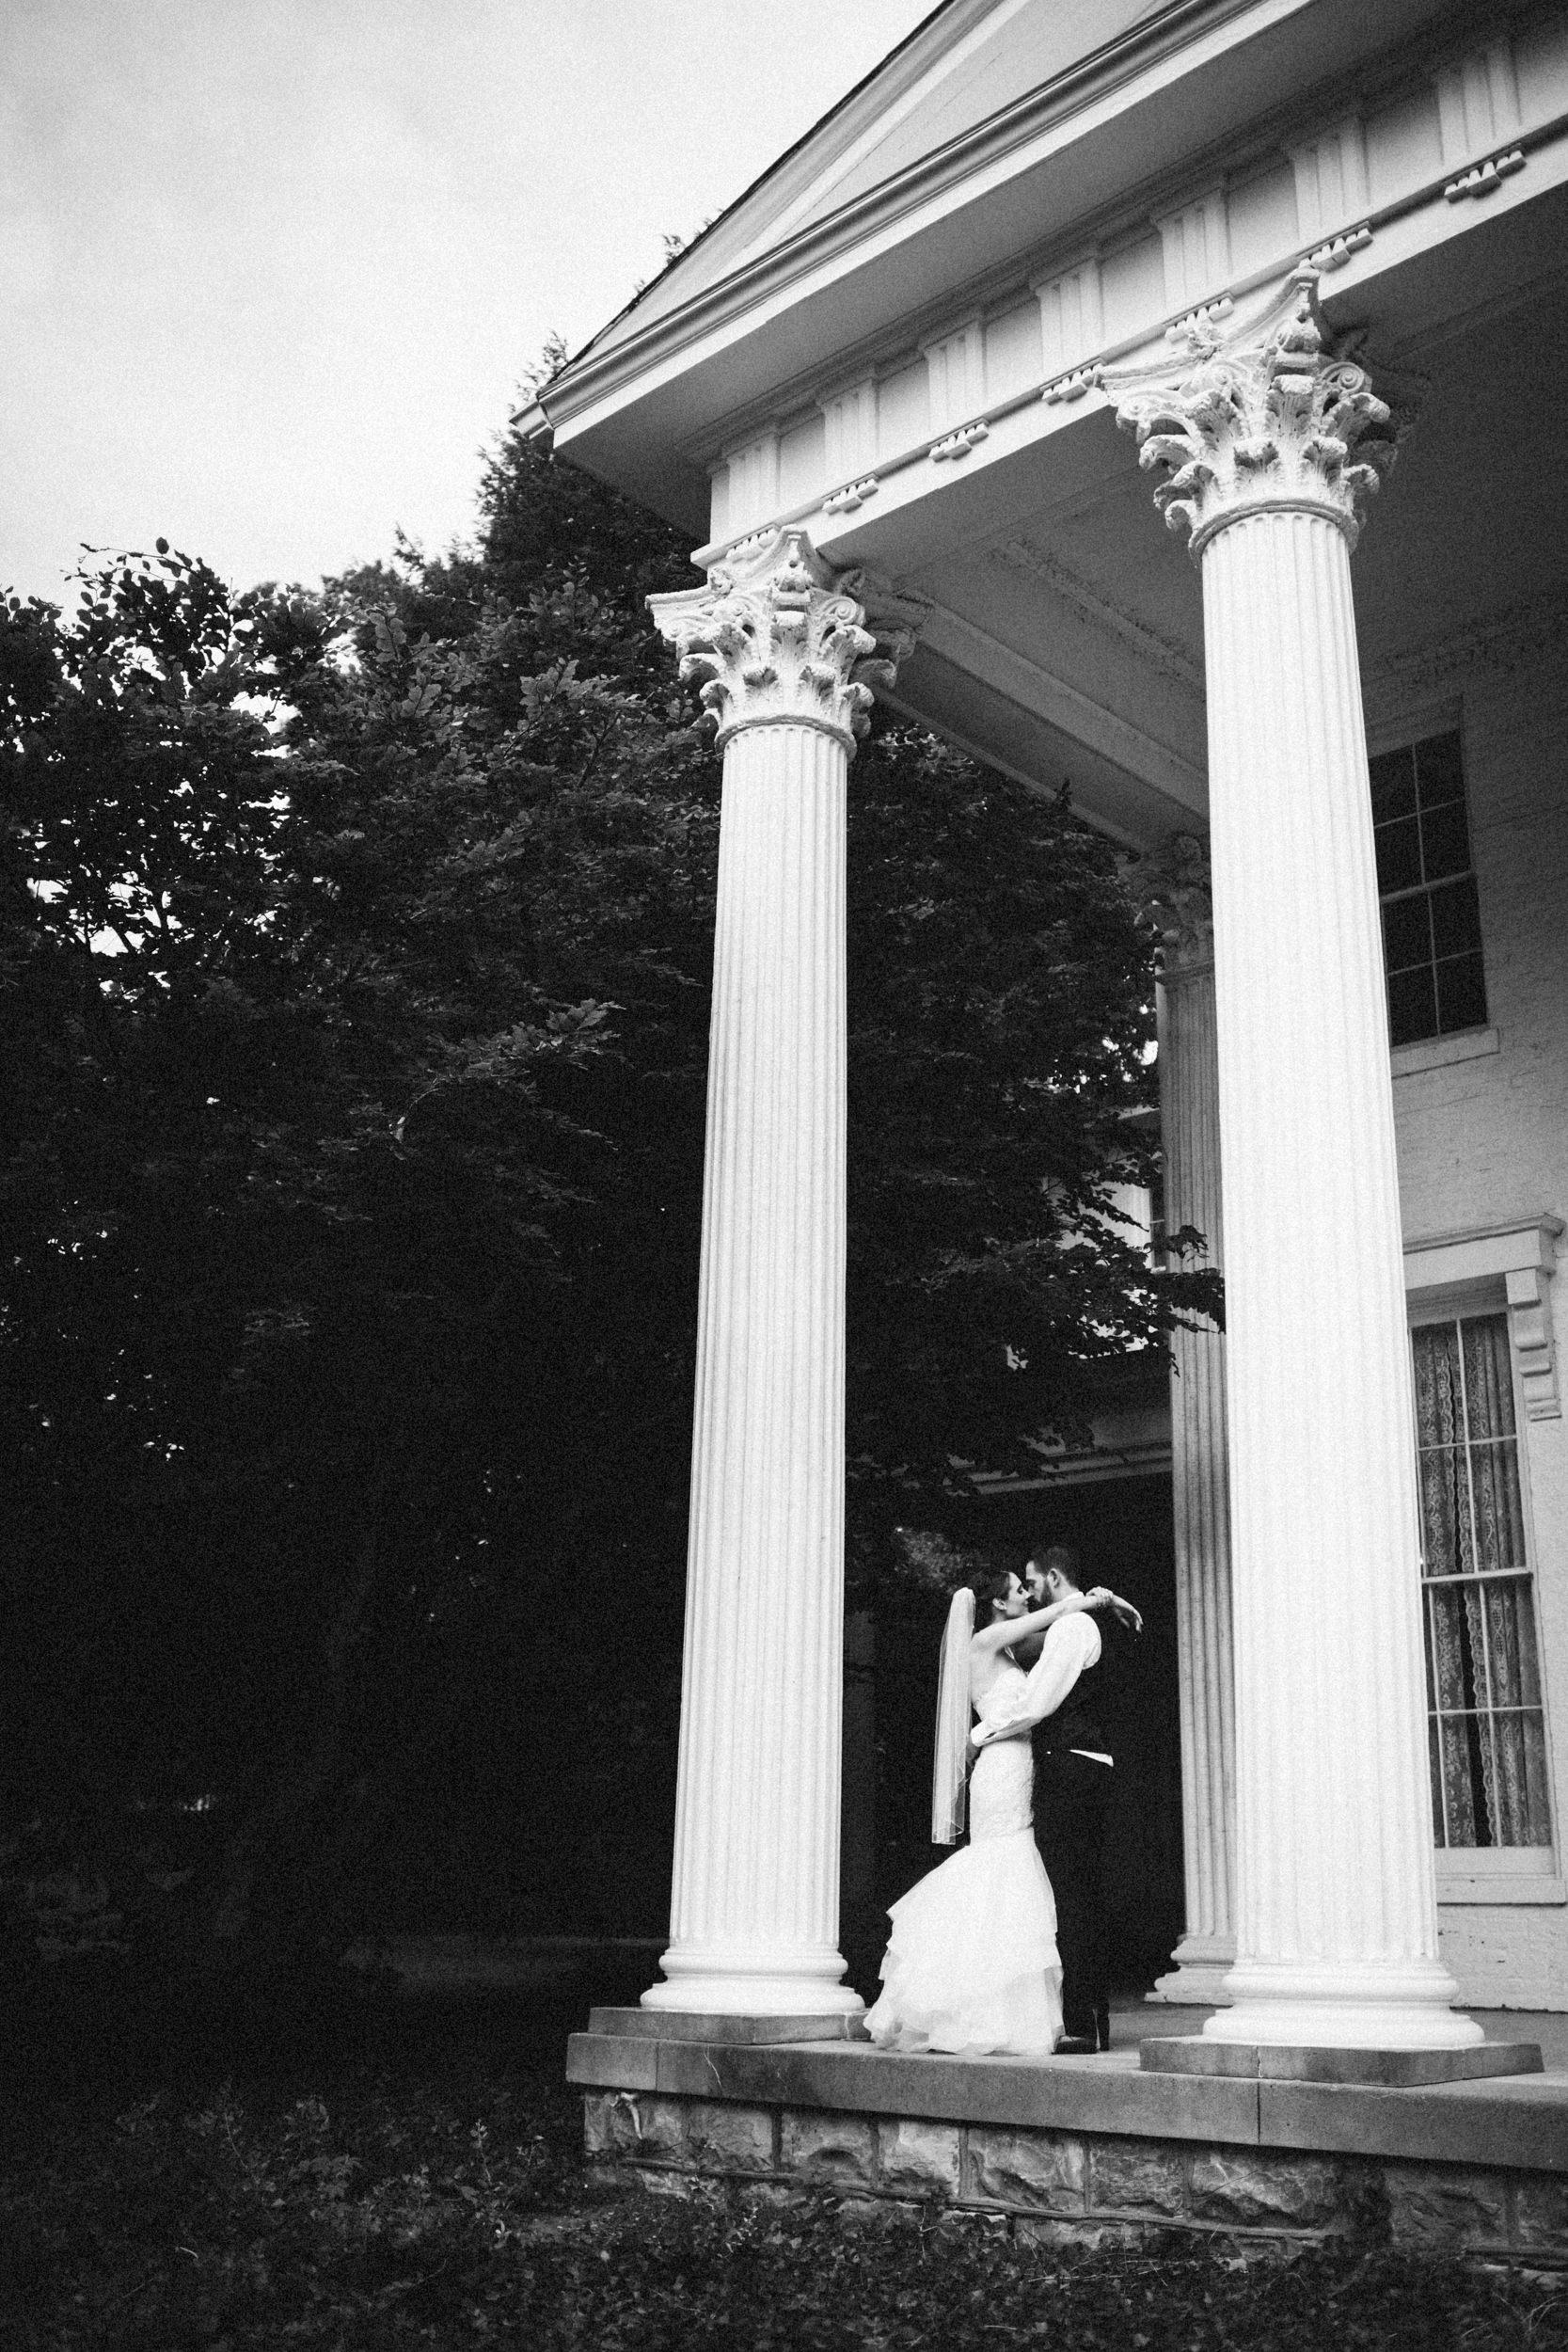 Louisville-Kentucky-Wedding-Elopement-Photographer-Sarah-Katherine-Davis-Photography-Whitehall-Classic-Timeless-Garden-Wedding-573.jpg